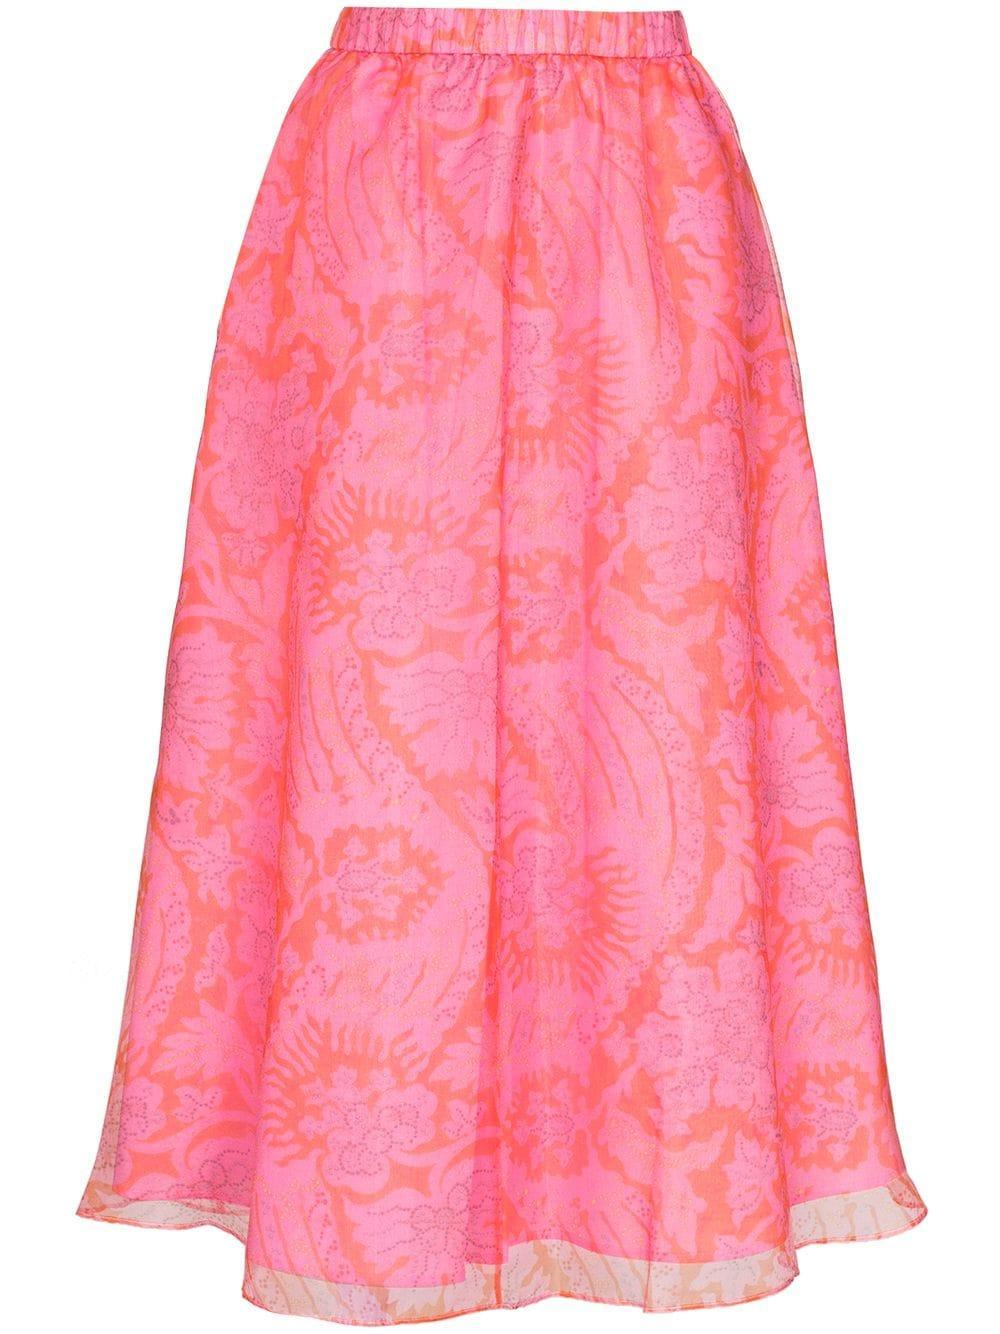 Mattia Midi Skirt Item # 169-4085